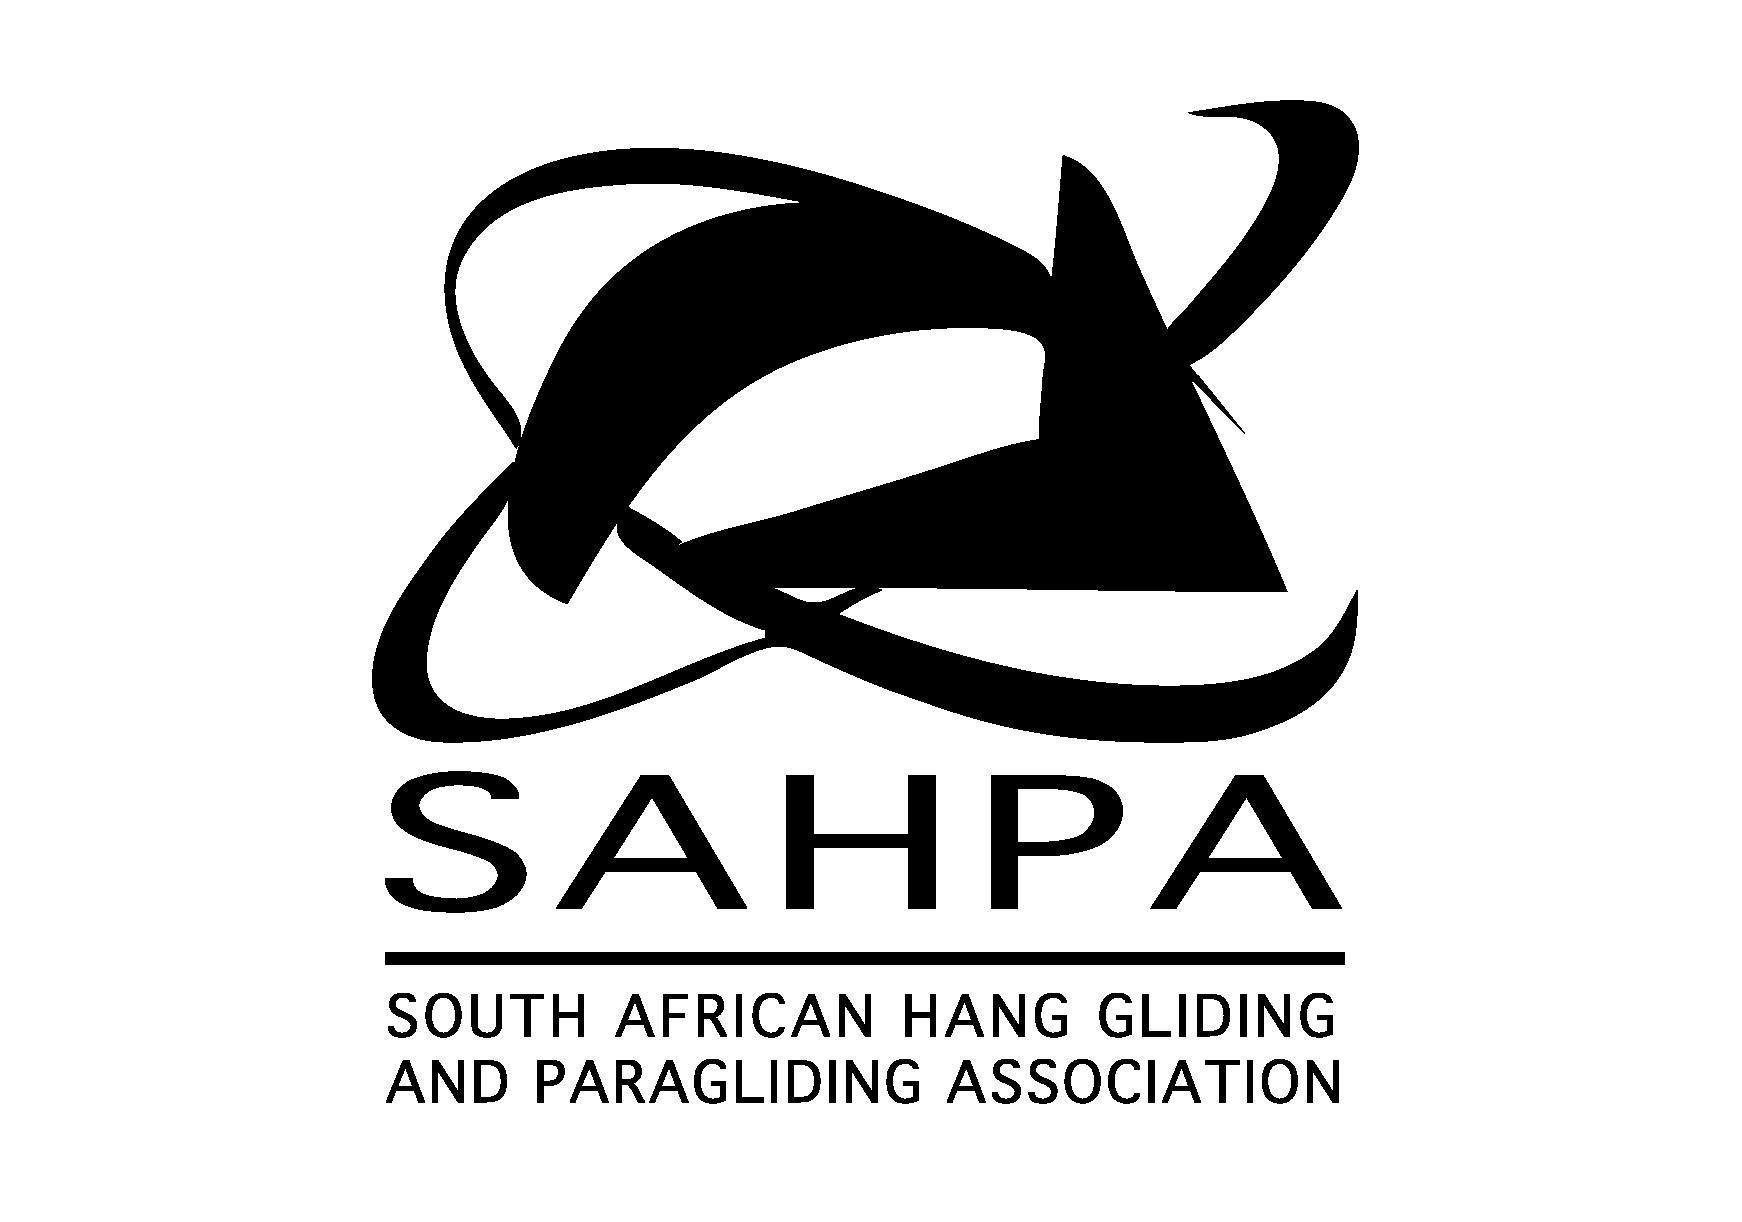 sahpa-01-01.png